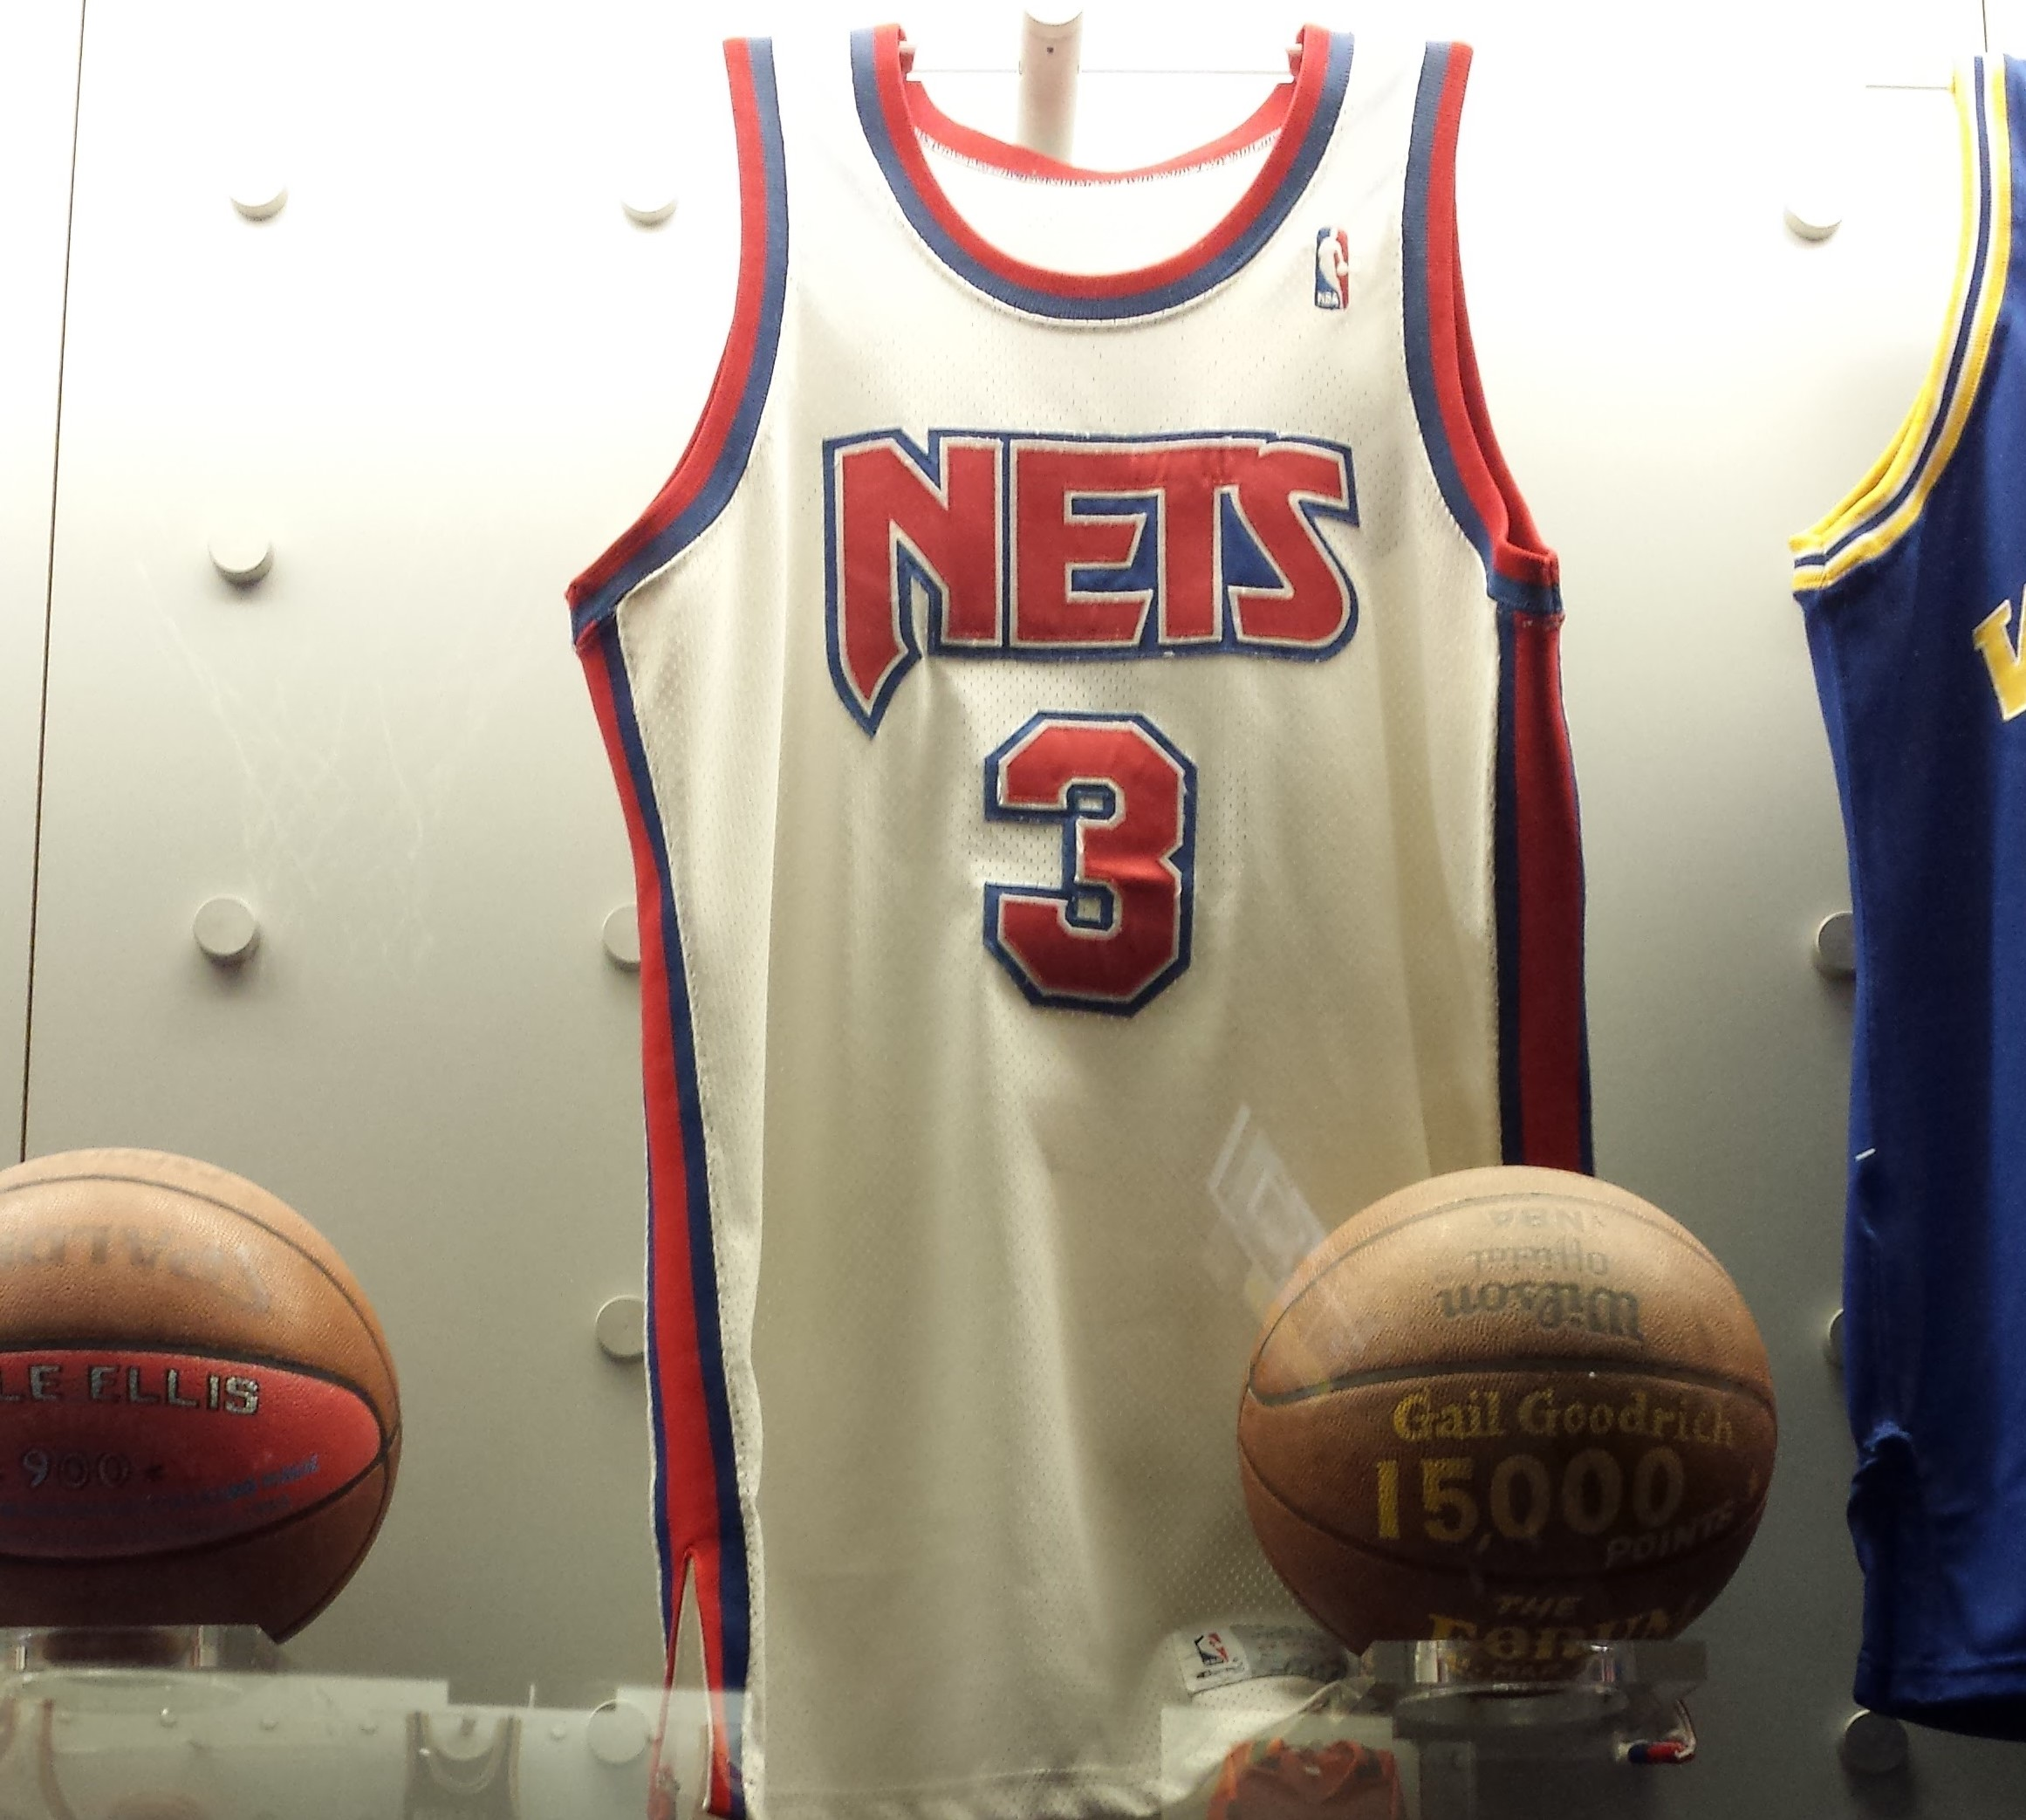 ... nets white jersey with red lettering. drazen petrovics drazen petrovic  ... 03b8f82f0